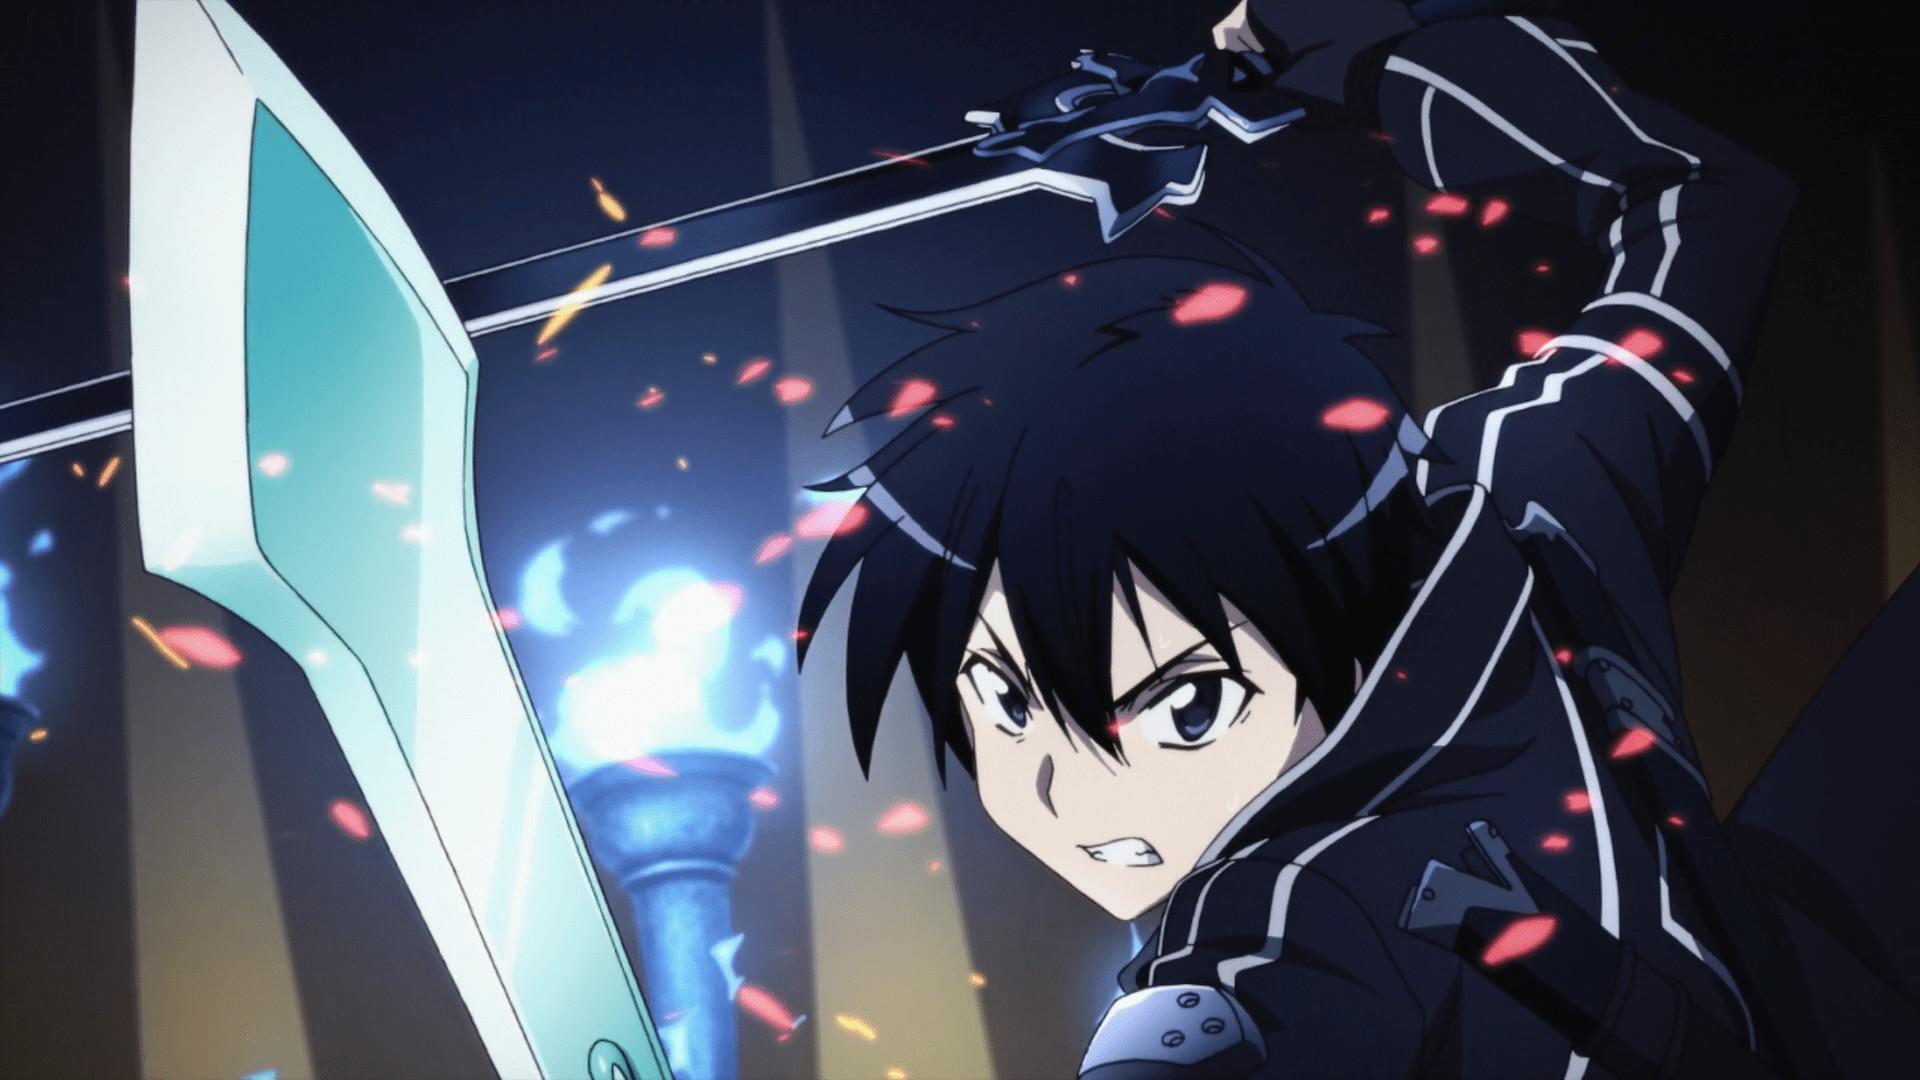 Skydance To Bring Sword Art Online Live Action Television